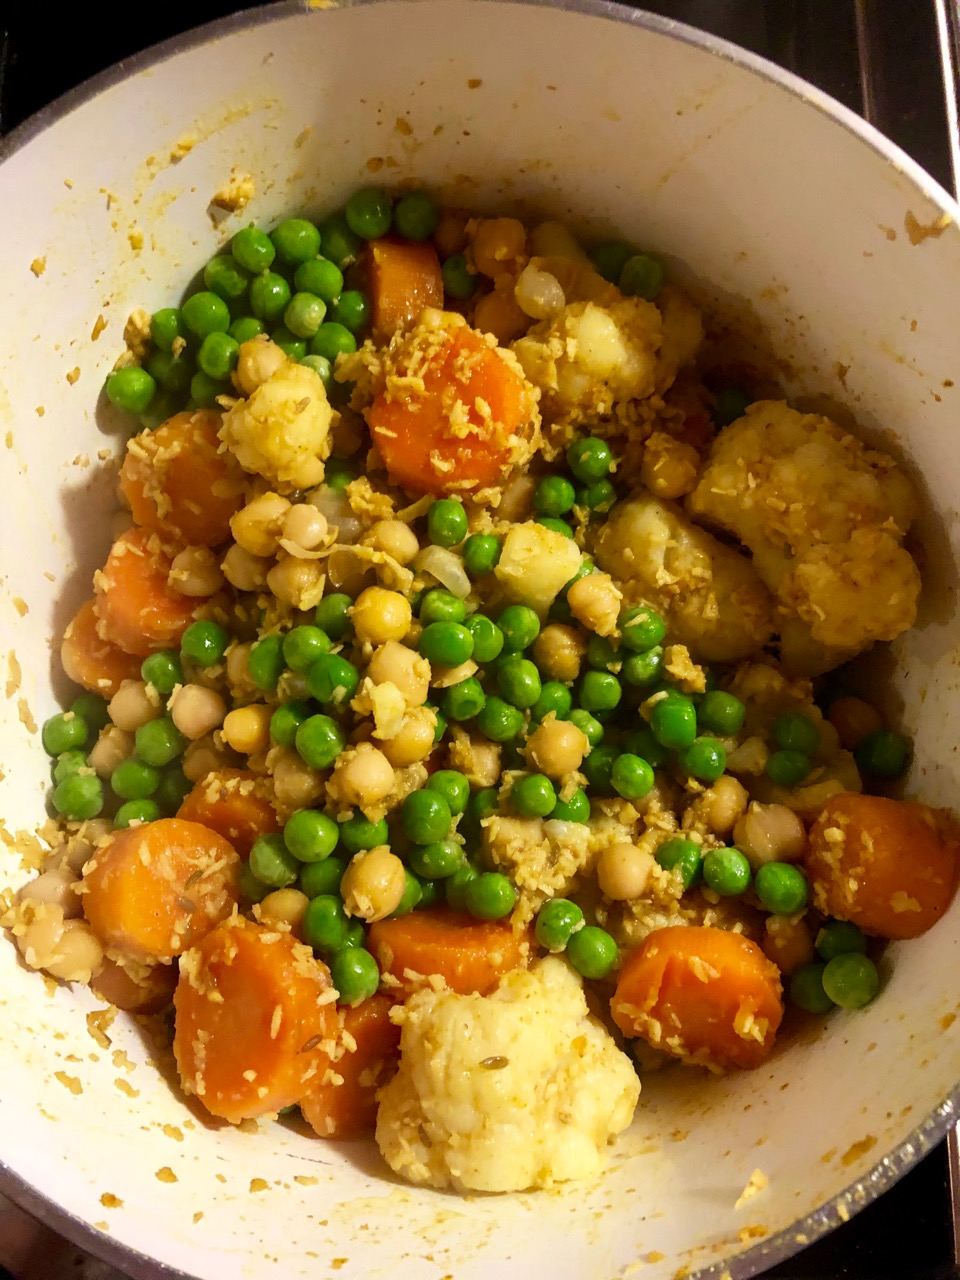 Vegetable curry: peas added